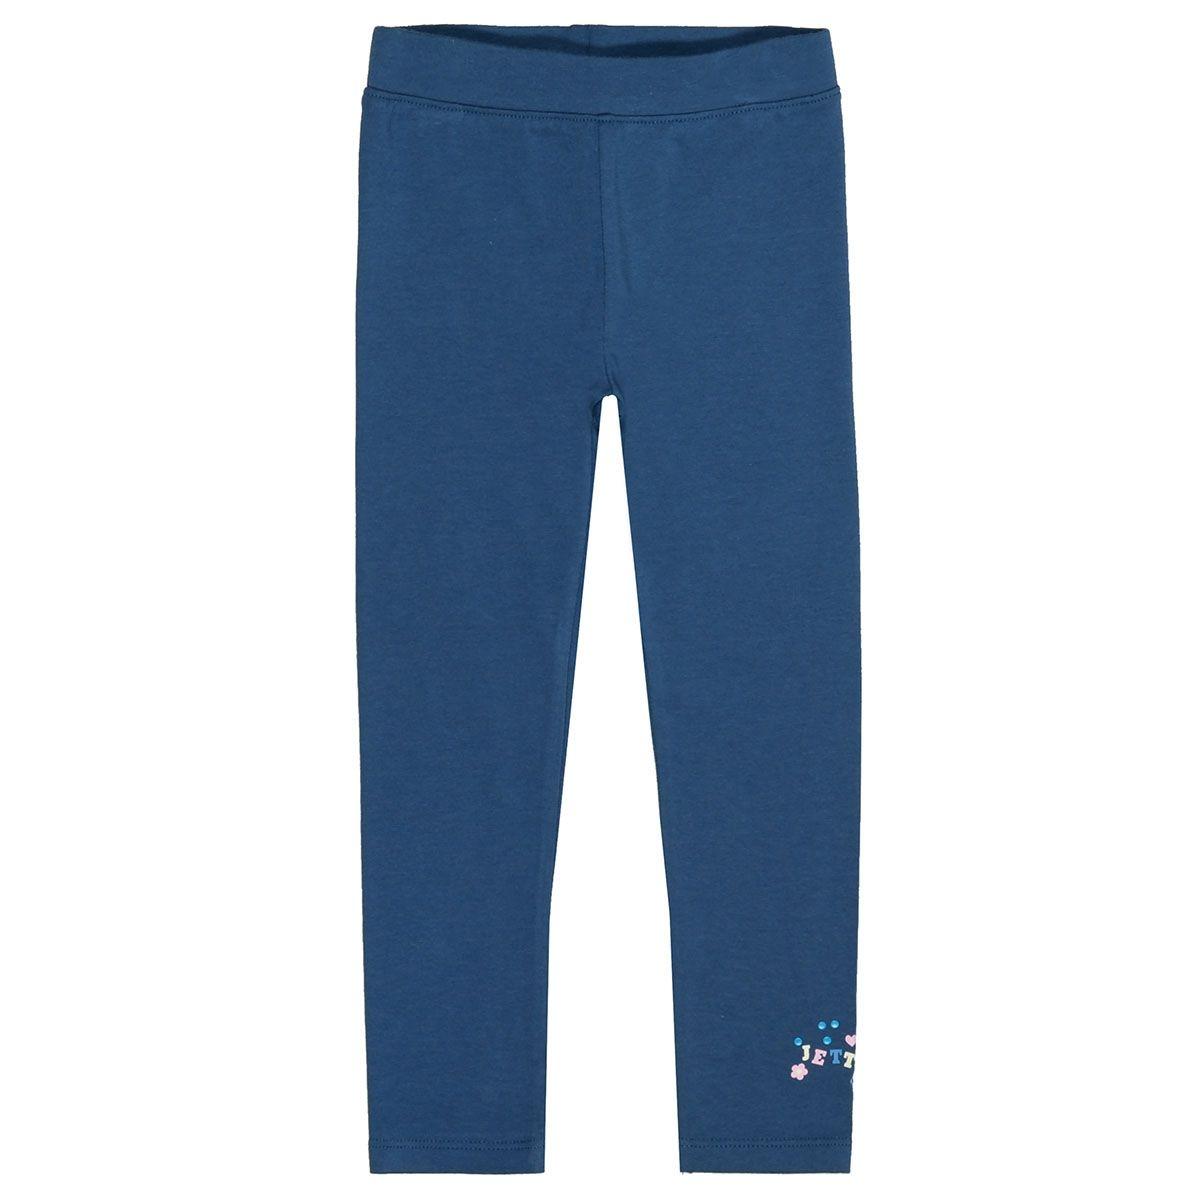 JETTE Leggings mit Logo-Print - Steel Blue